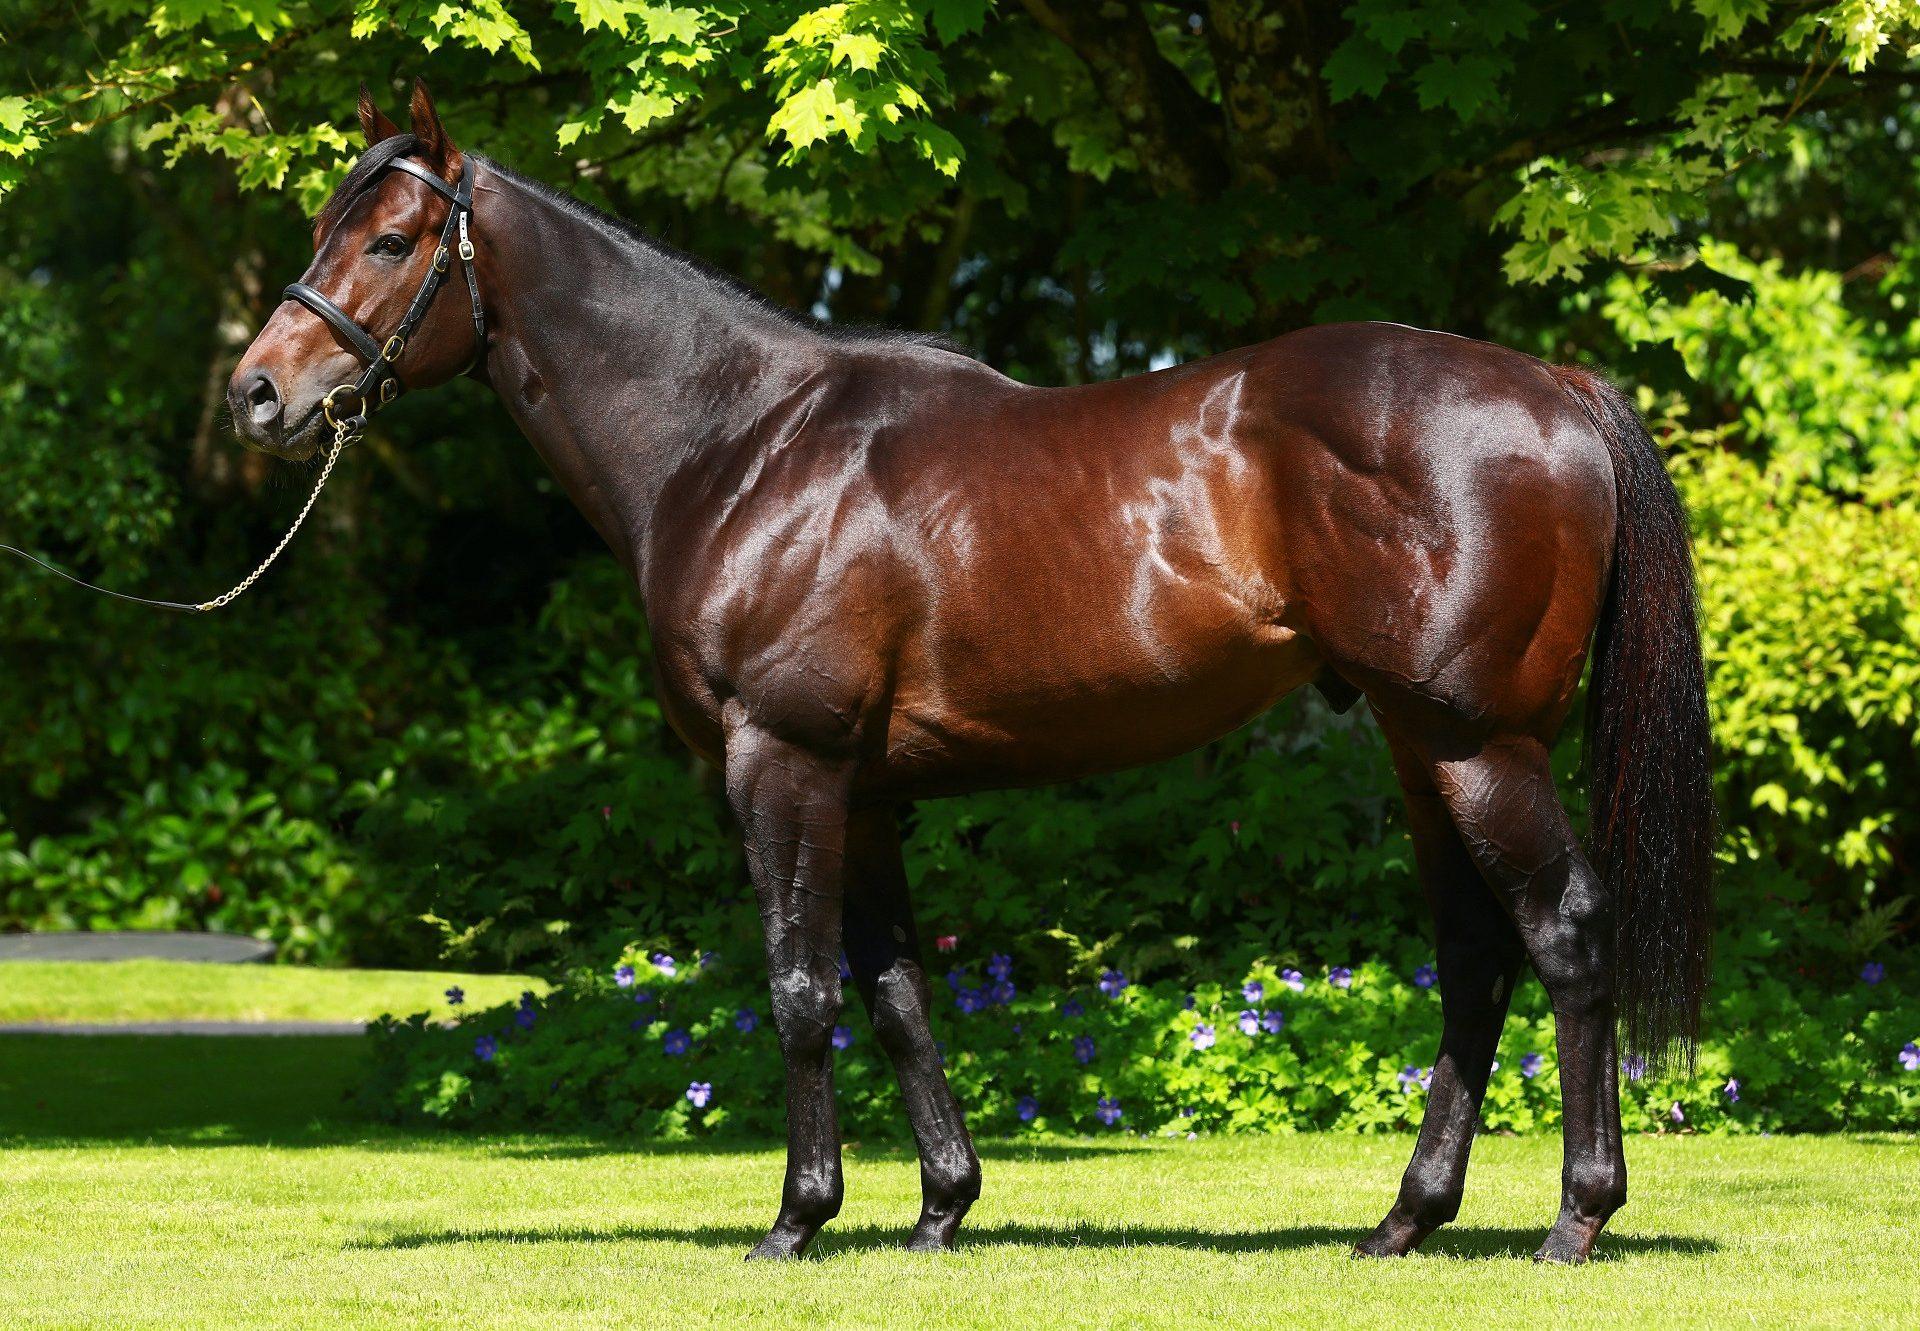 Pride Of Dubai ex Isstoora filly foal